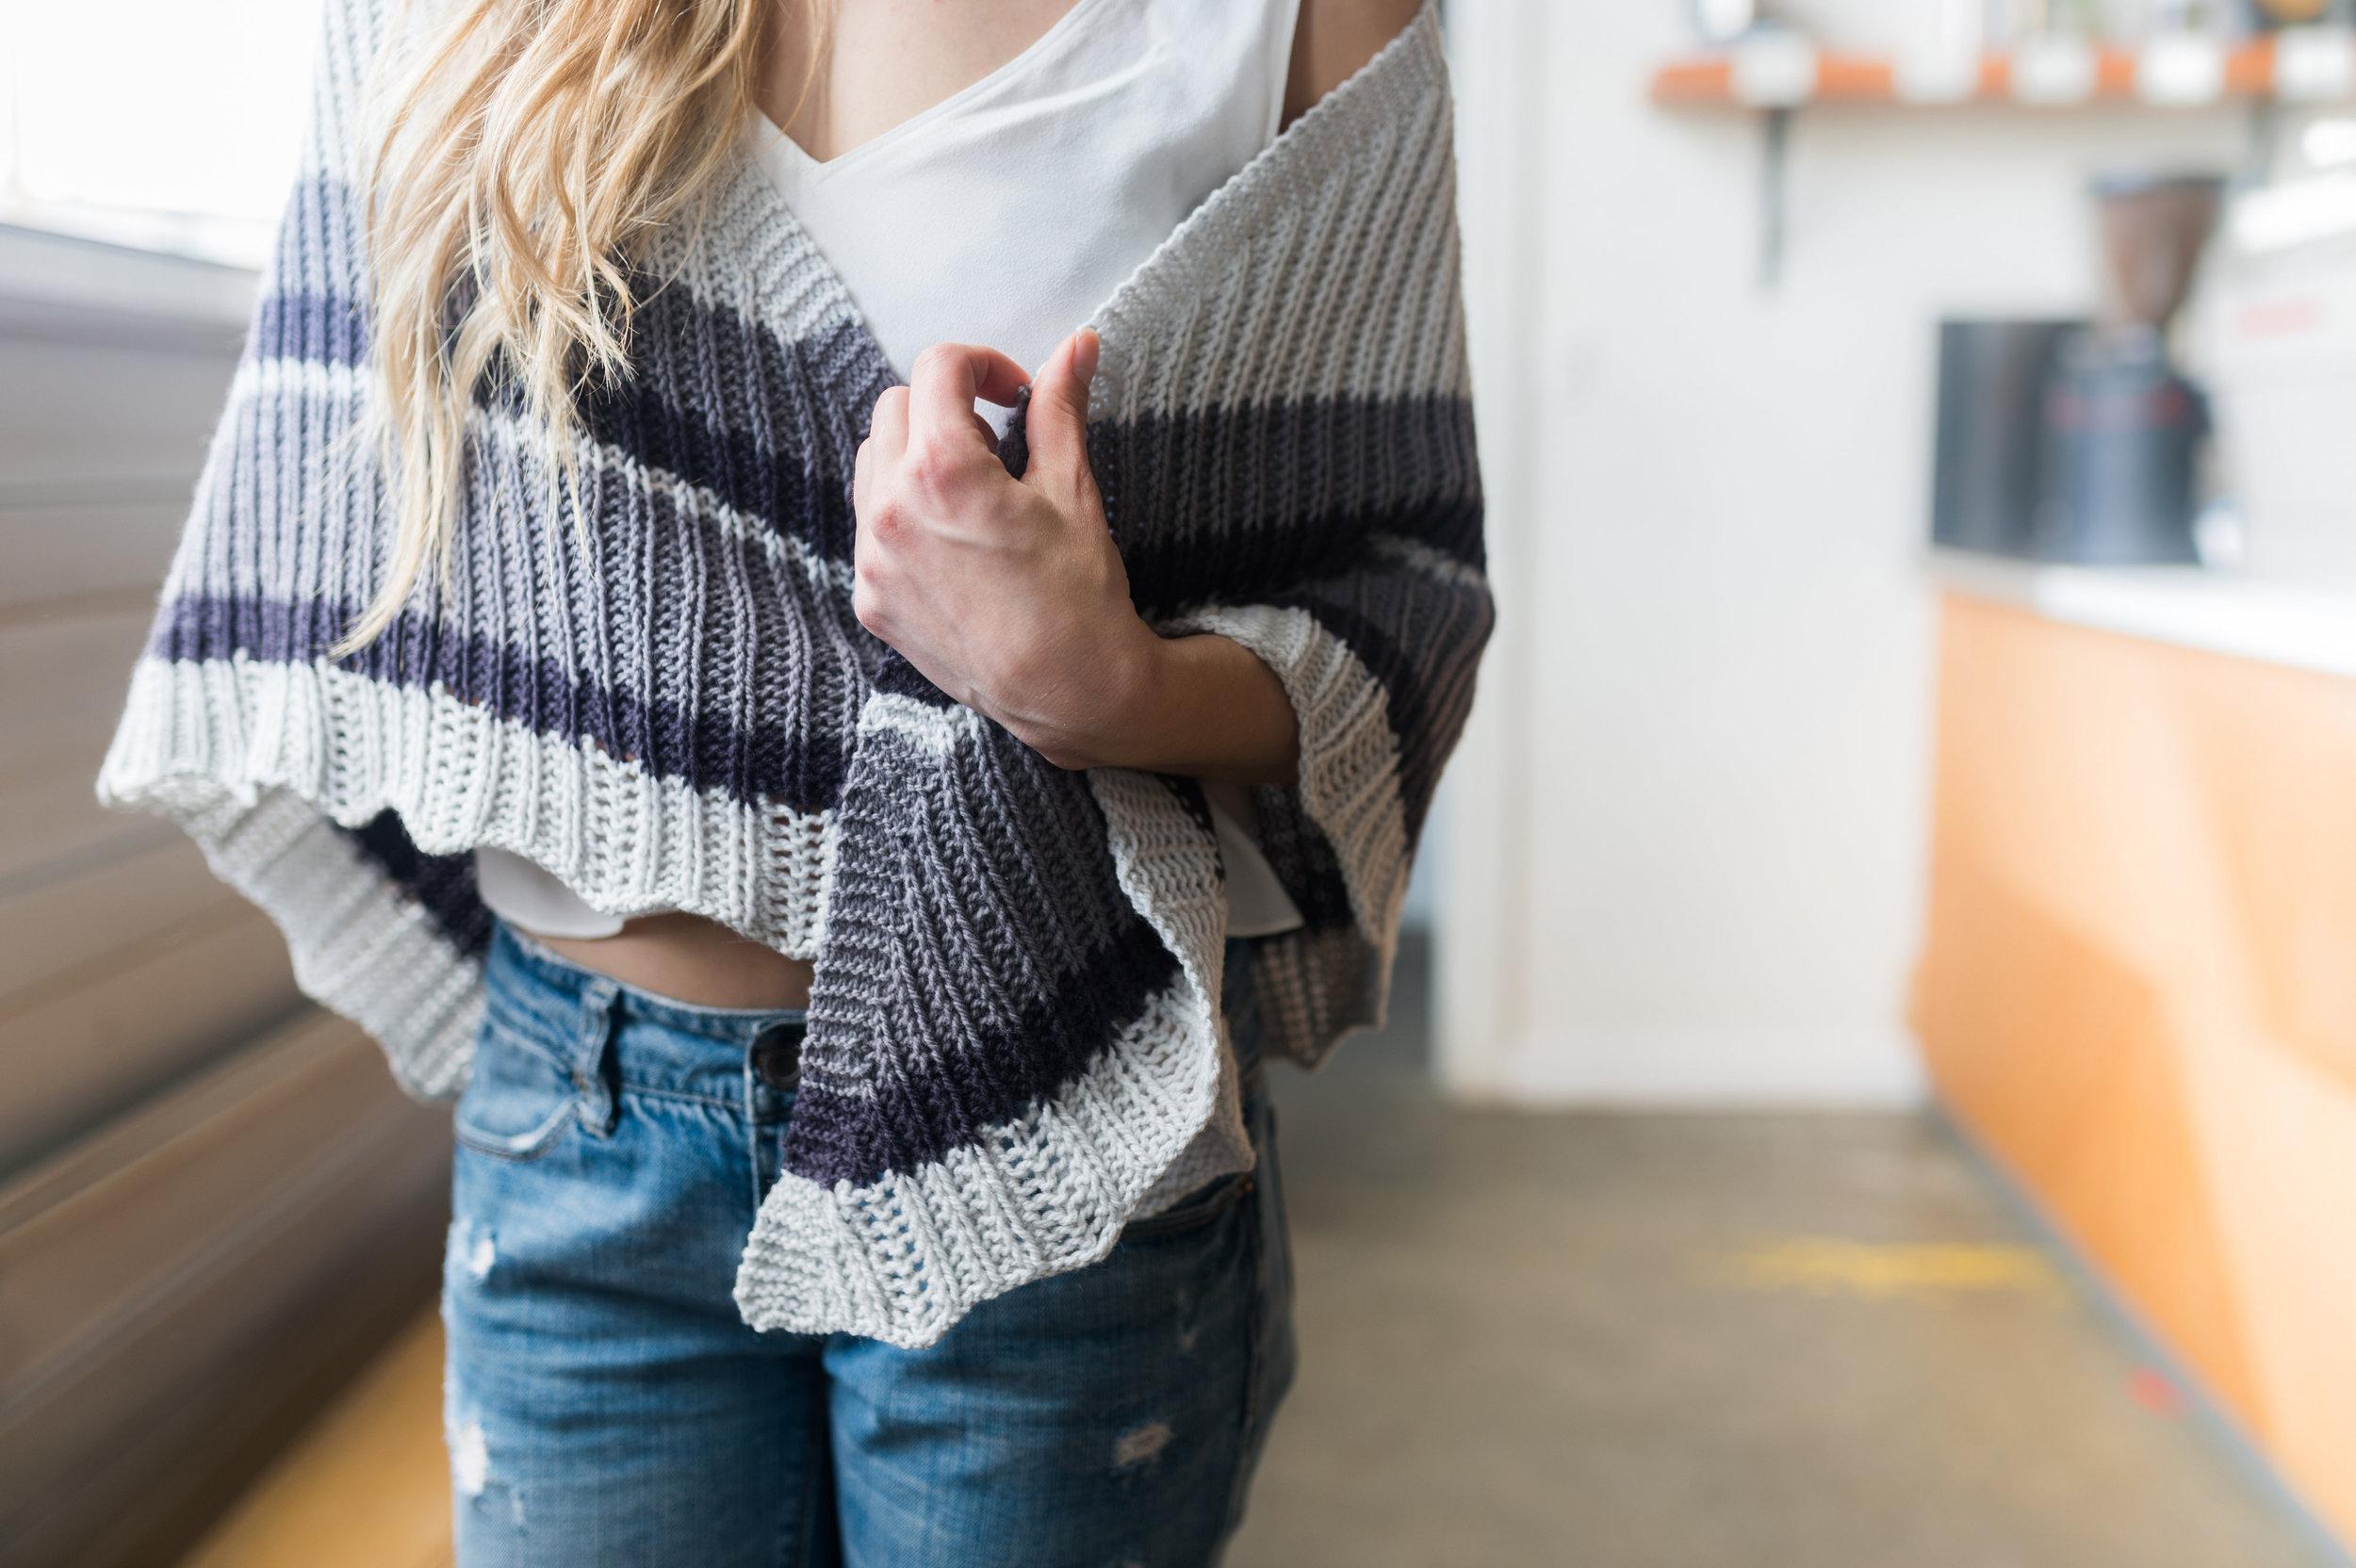 ATMEN Shawl Knitting Pattern by Shannon Cook of VeryShannon.com #atmenshawl